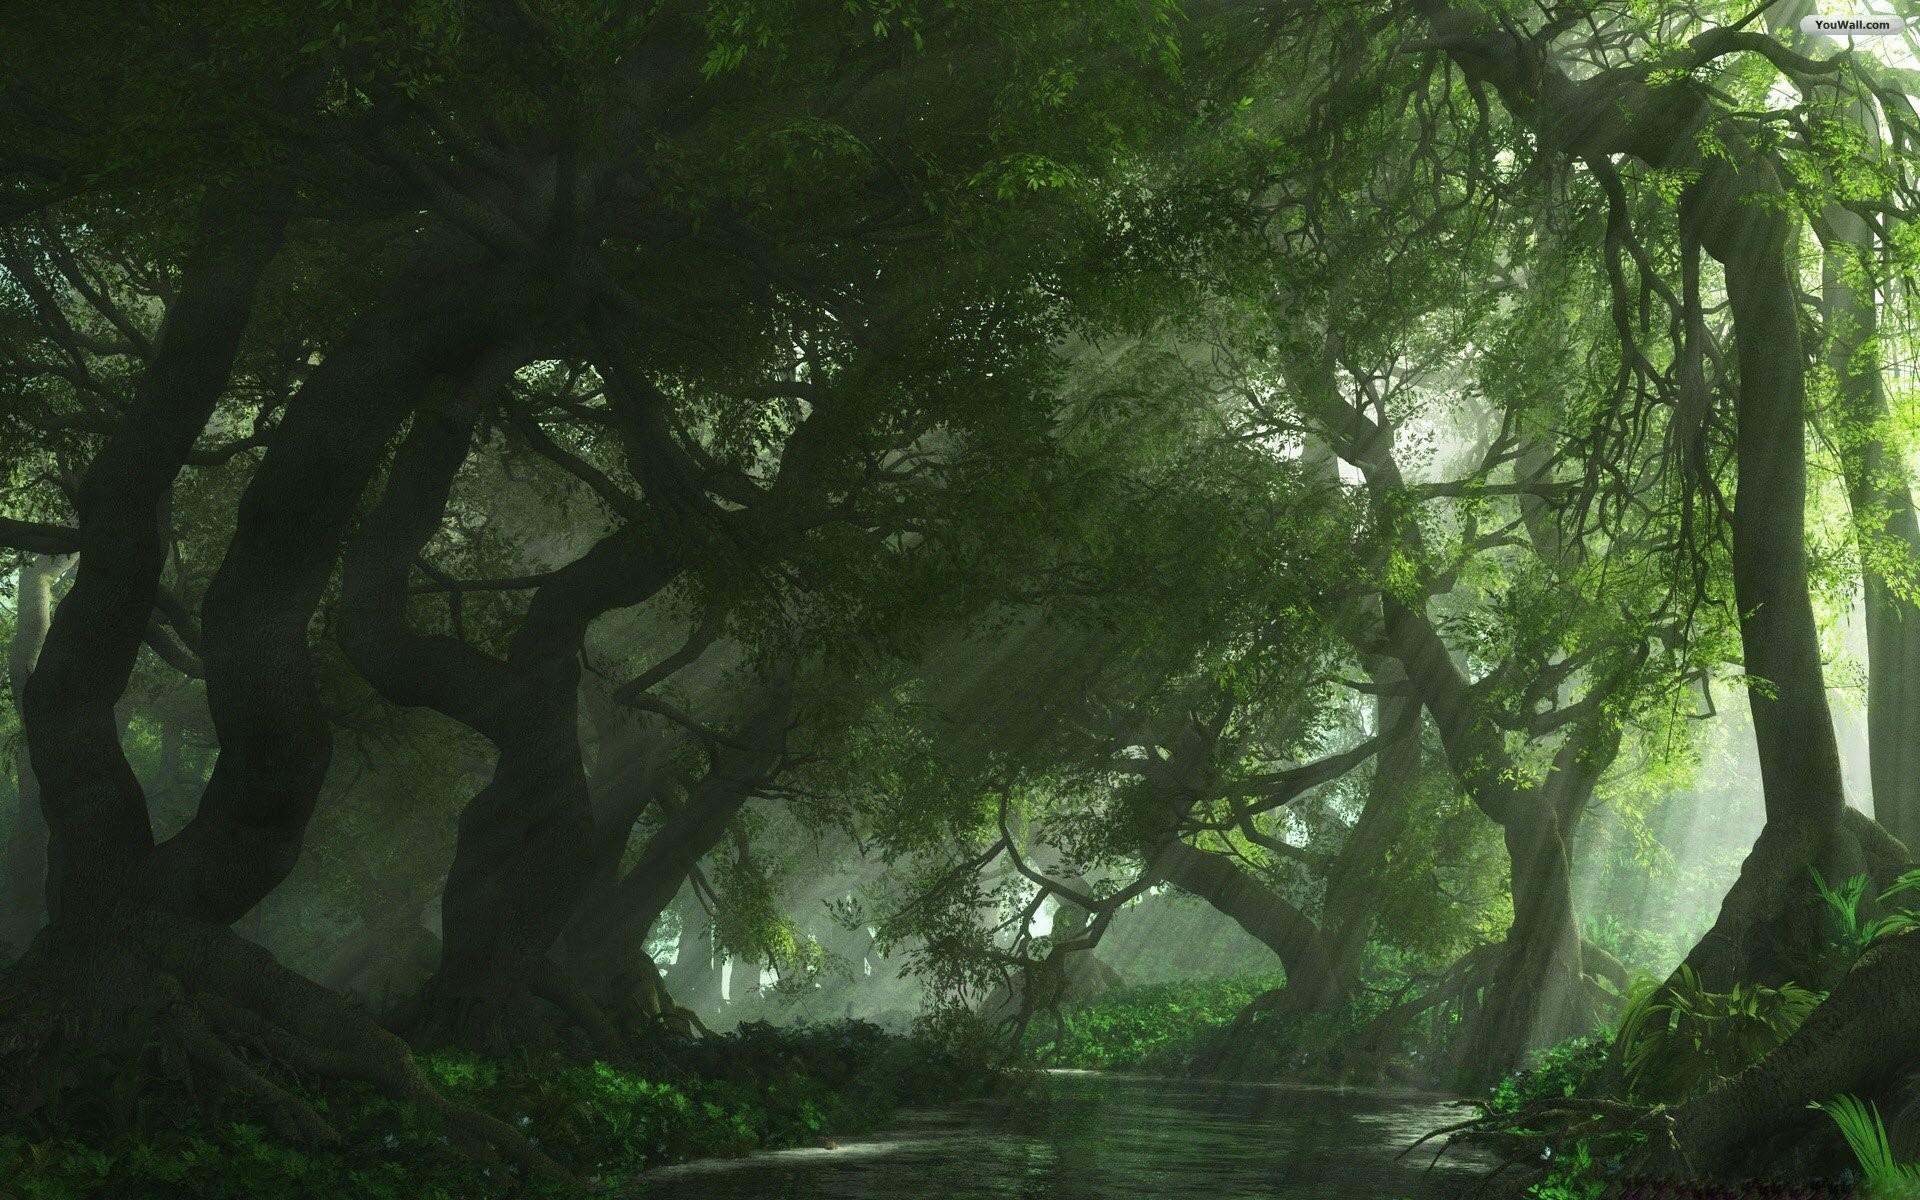 Beautiful Wallpaper Macbook Forest - 537089-green-forest-background-1920x1200-for-macbook  Trends_346861.jpg